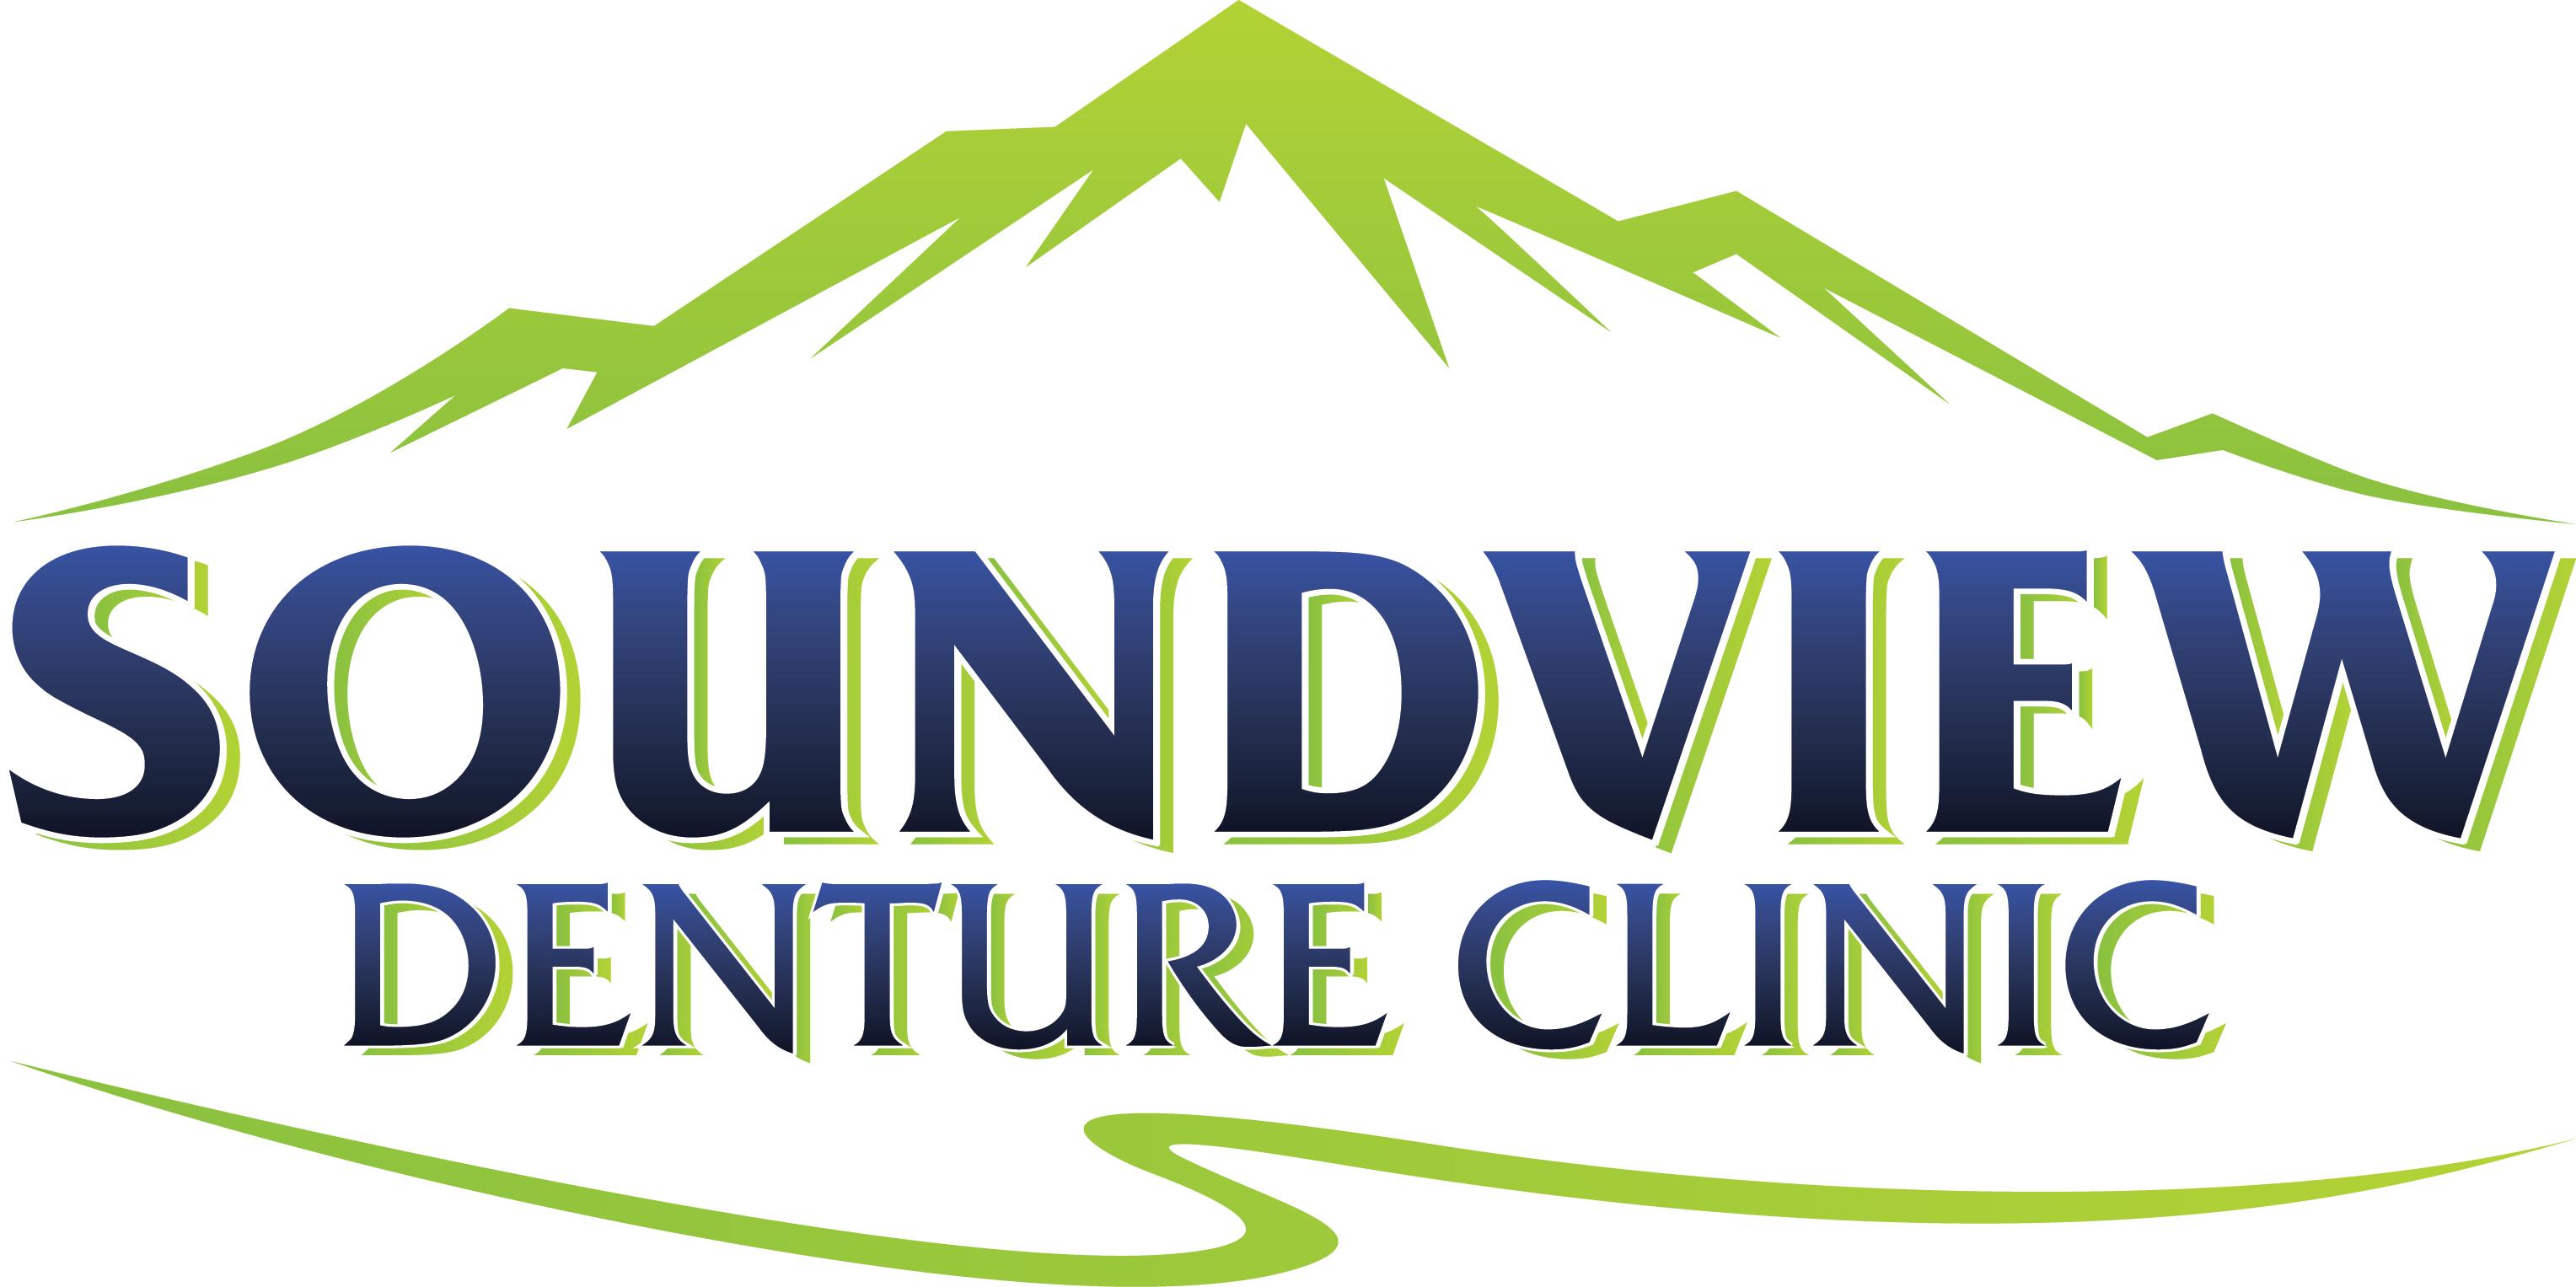 Soundview Denture Clinic 5800 Soundview Dr Gig Harbor Wa